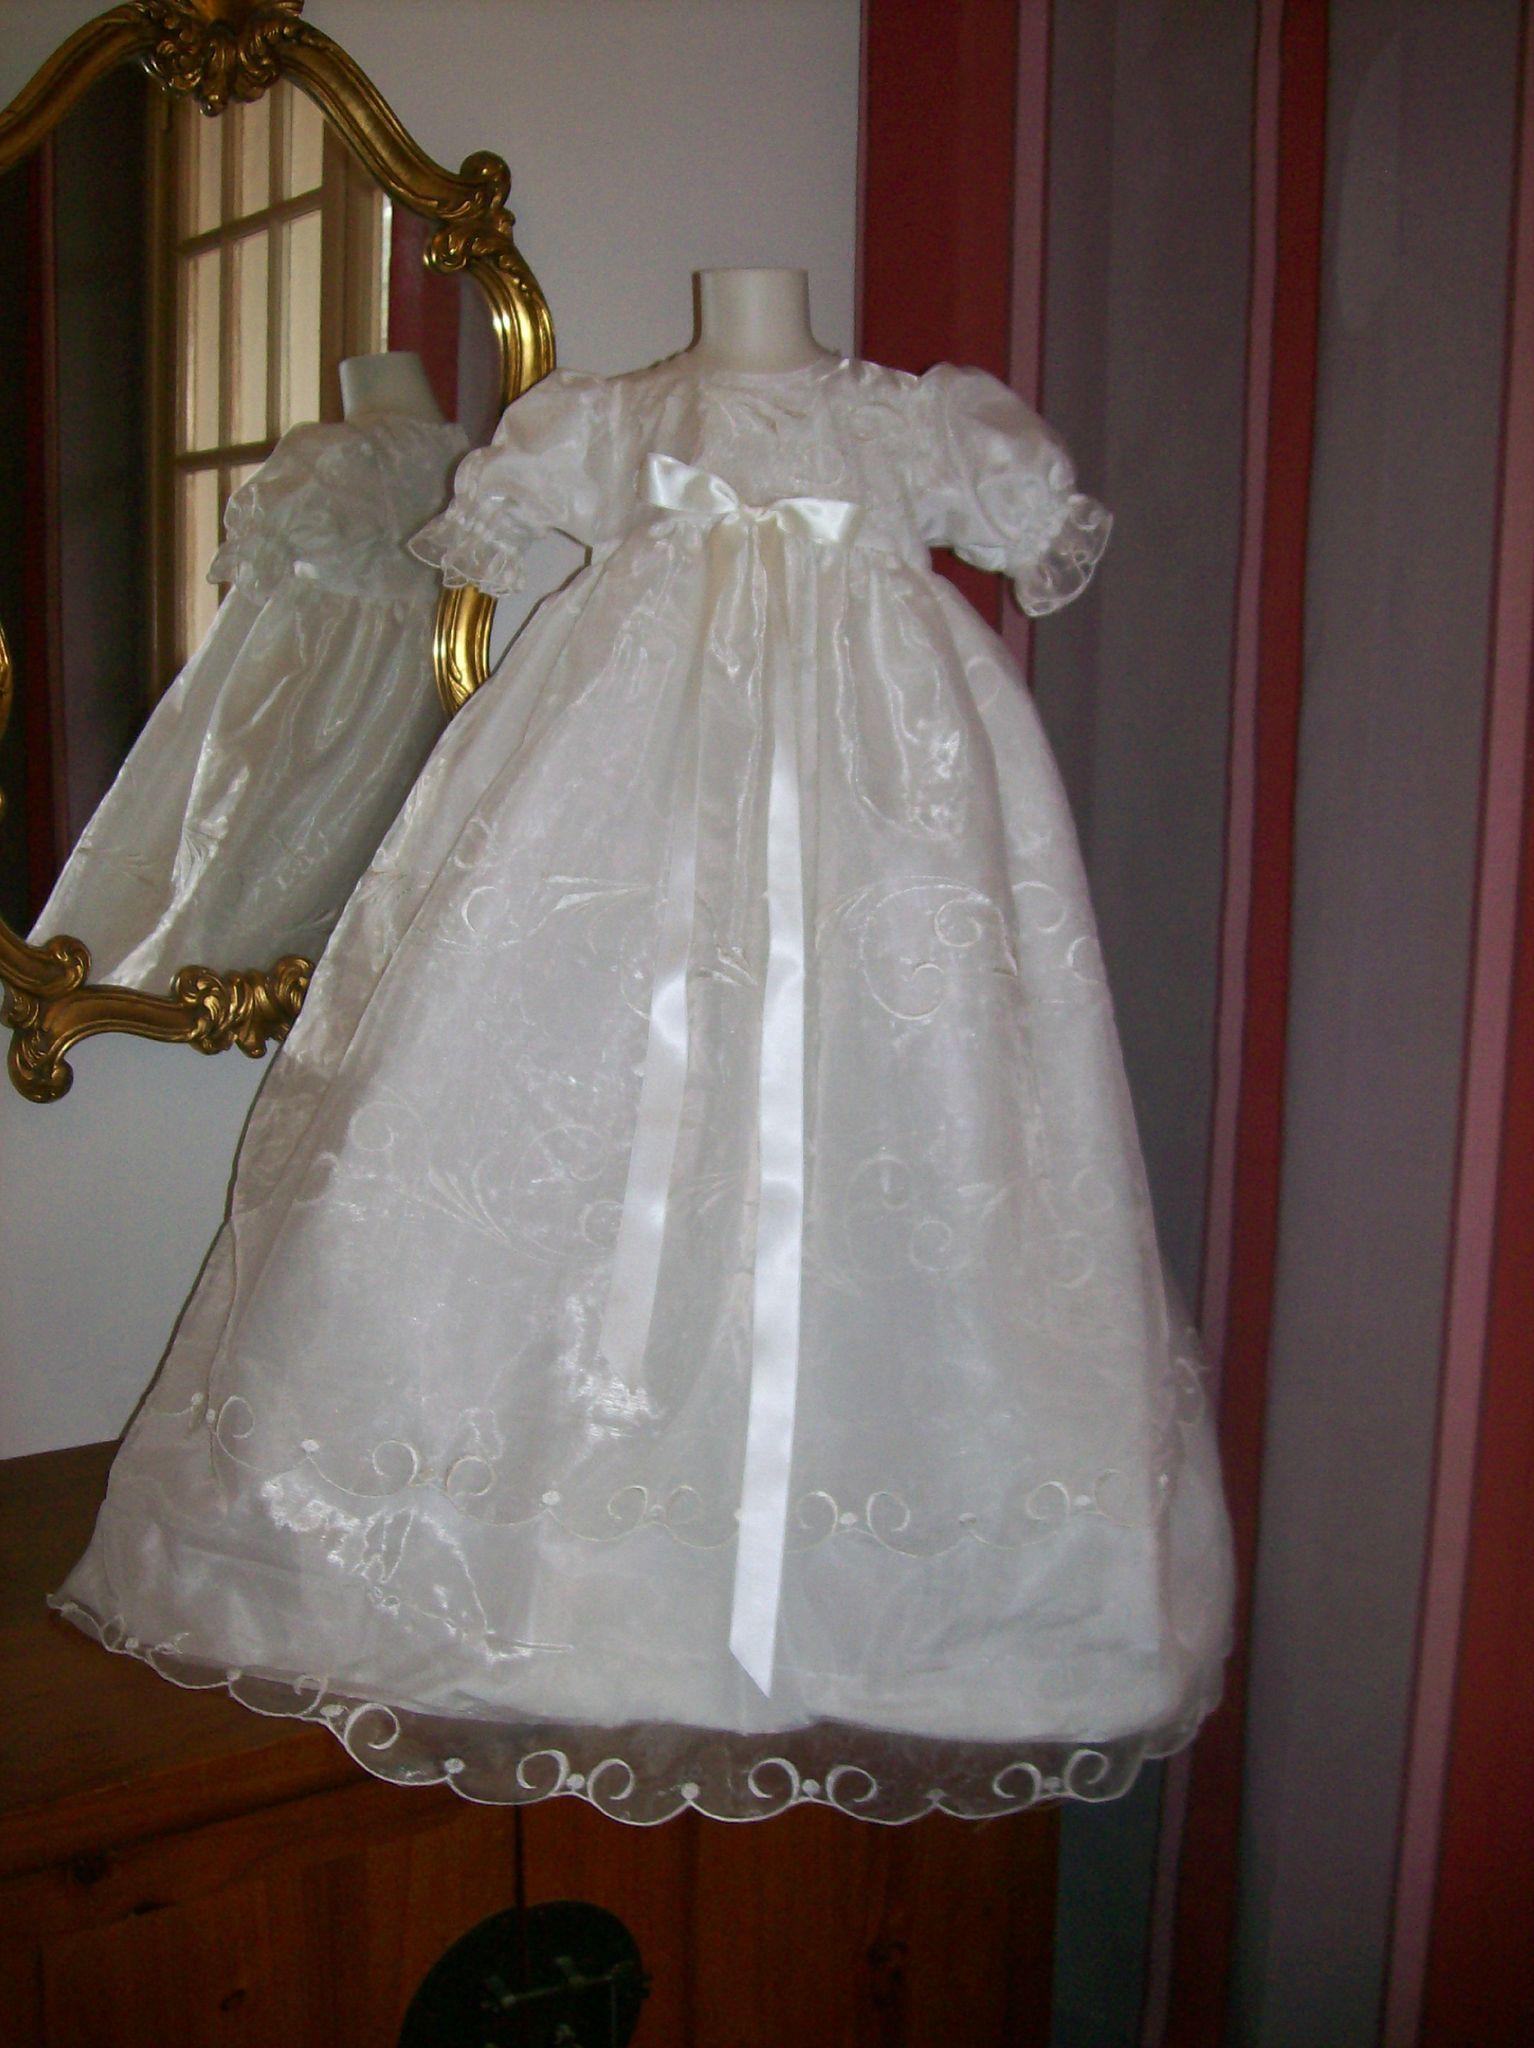 robe longue de bapteme brod e festonn e noeud satin devant taille 9 12 mois possibilit e de. Black Bedroom Furniture Sets. Home Design Ideas